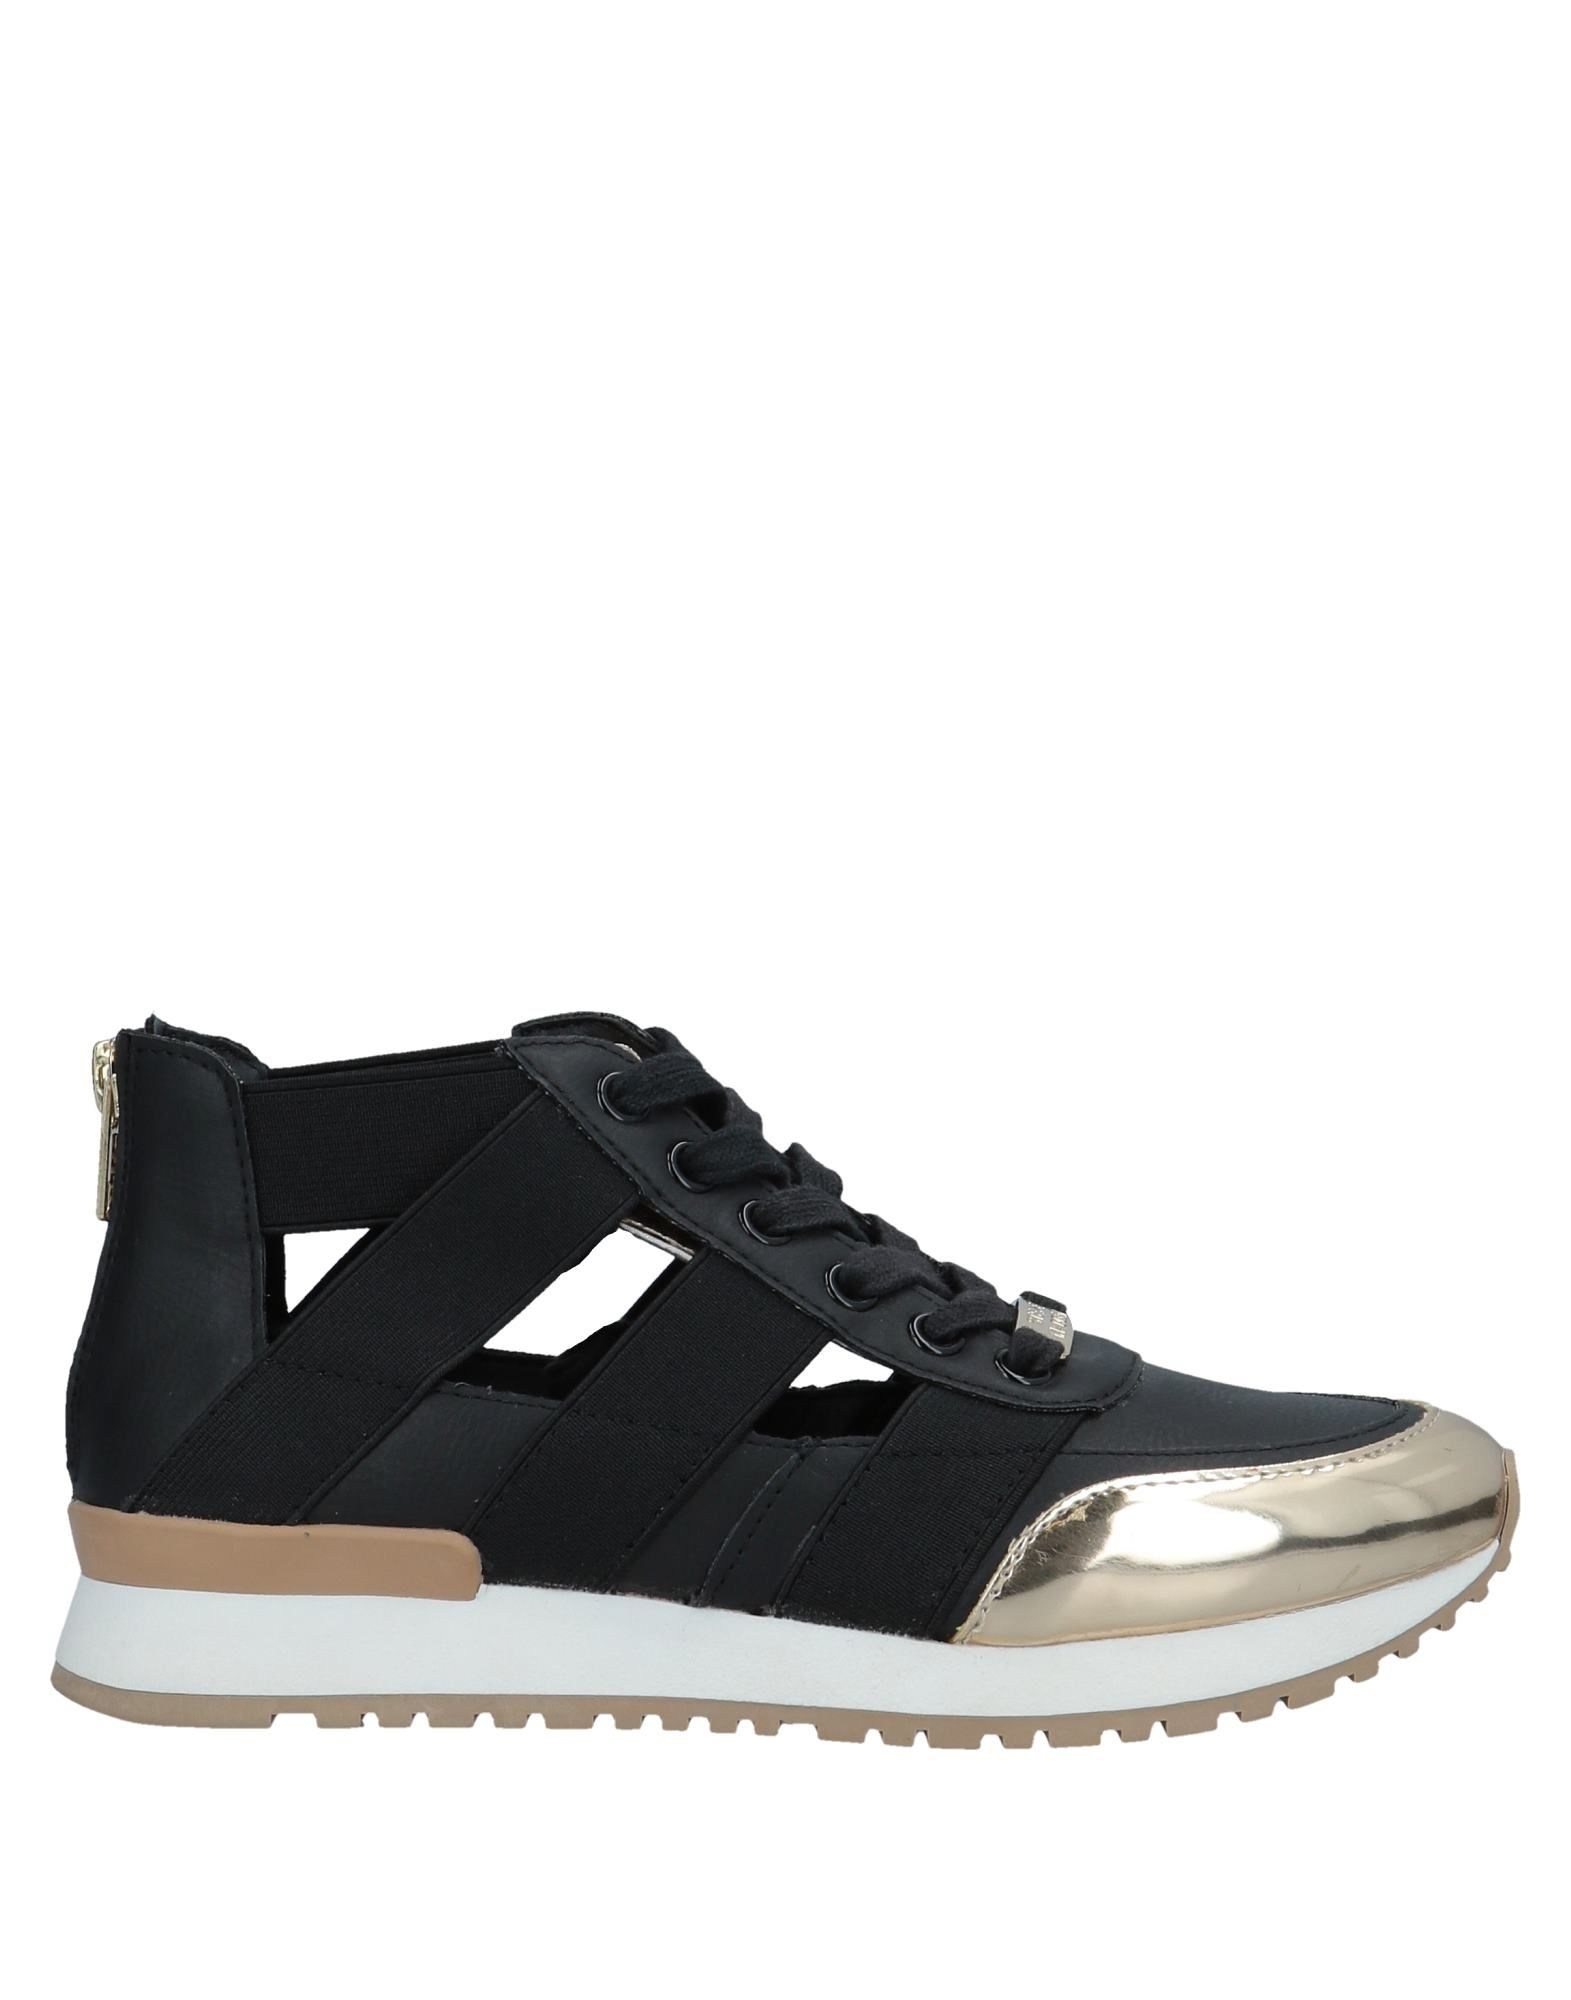 Gut um billige Schuhe zu tragenSteve Madden Sneakers Damen  11559135MM